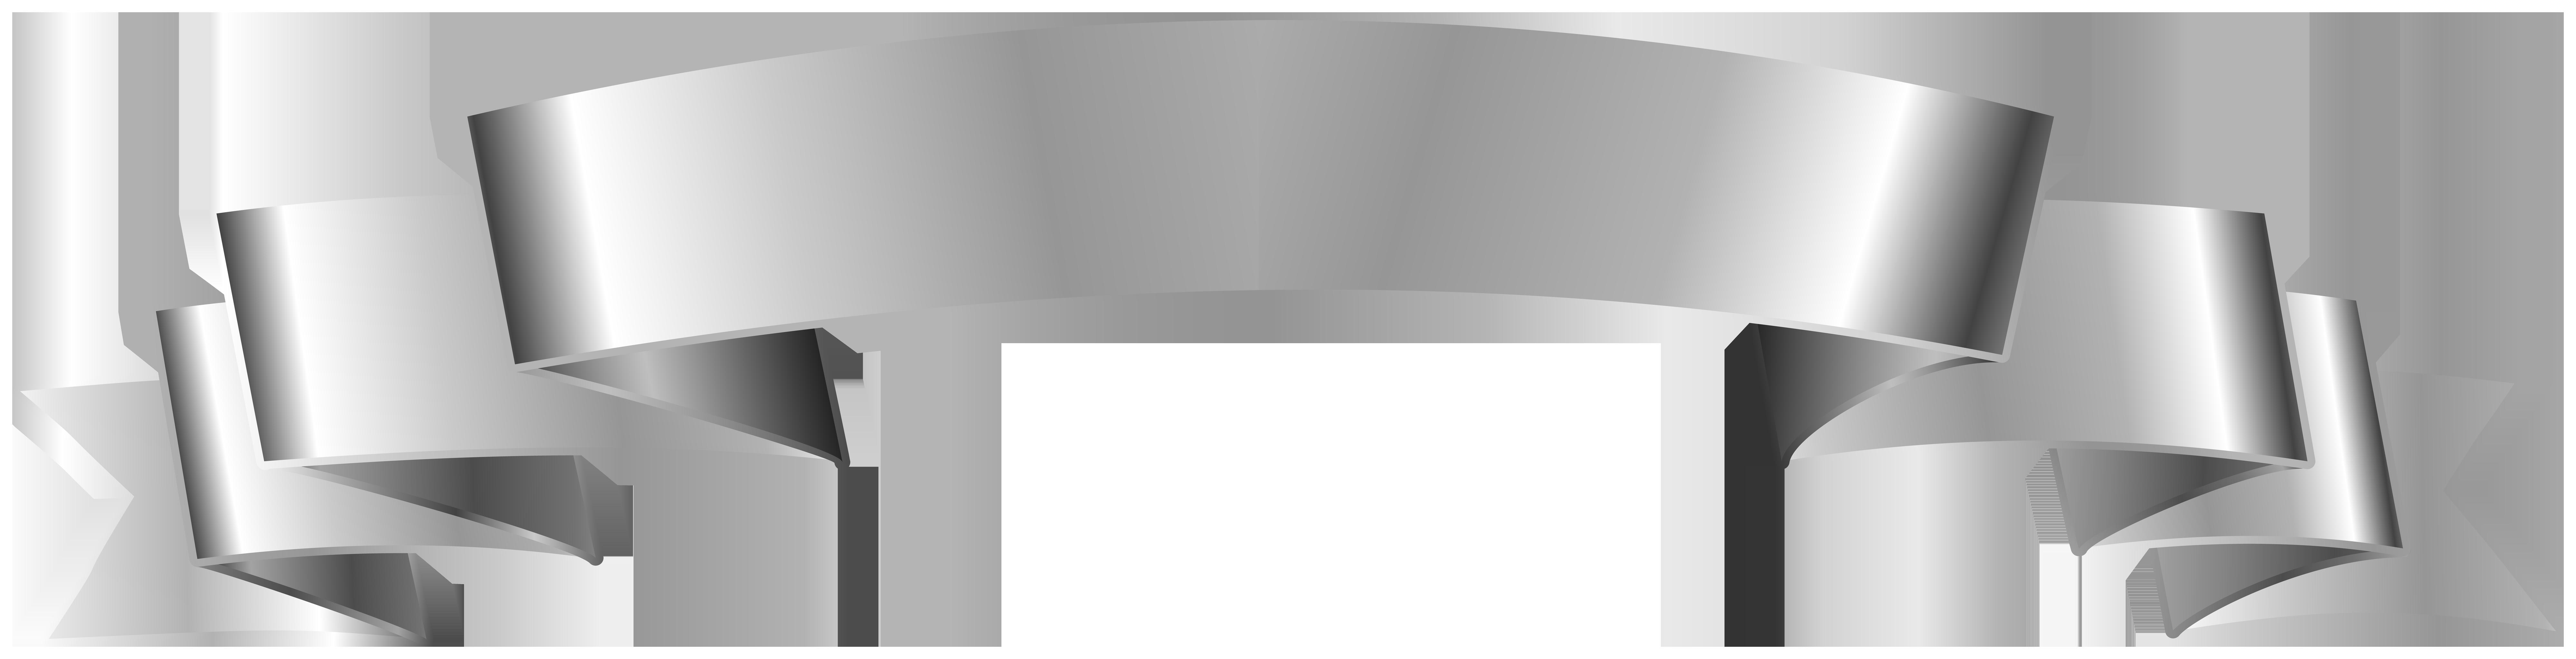 Silver Banner Clip Art Image.